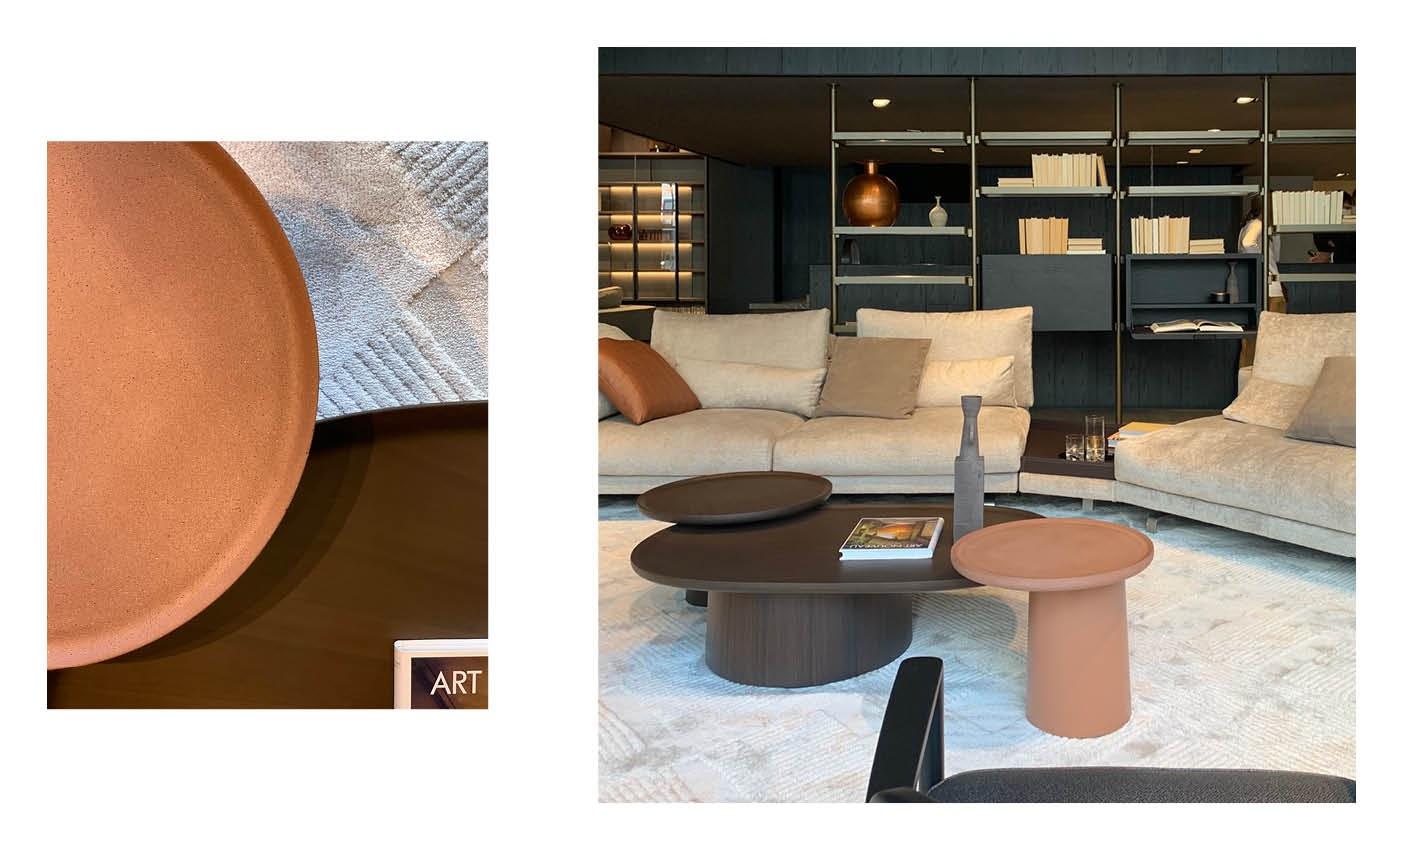 milan design week 2020 and molteni&c showroom